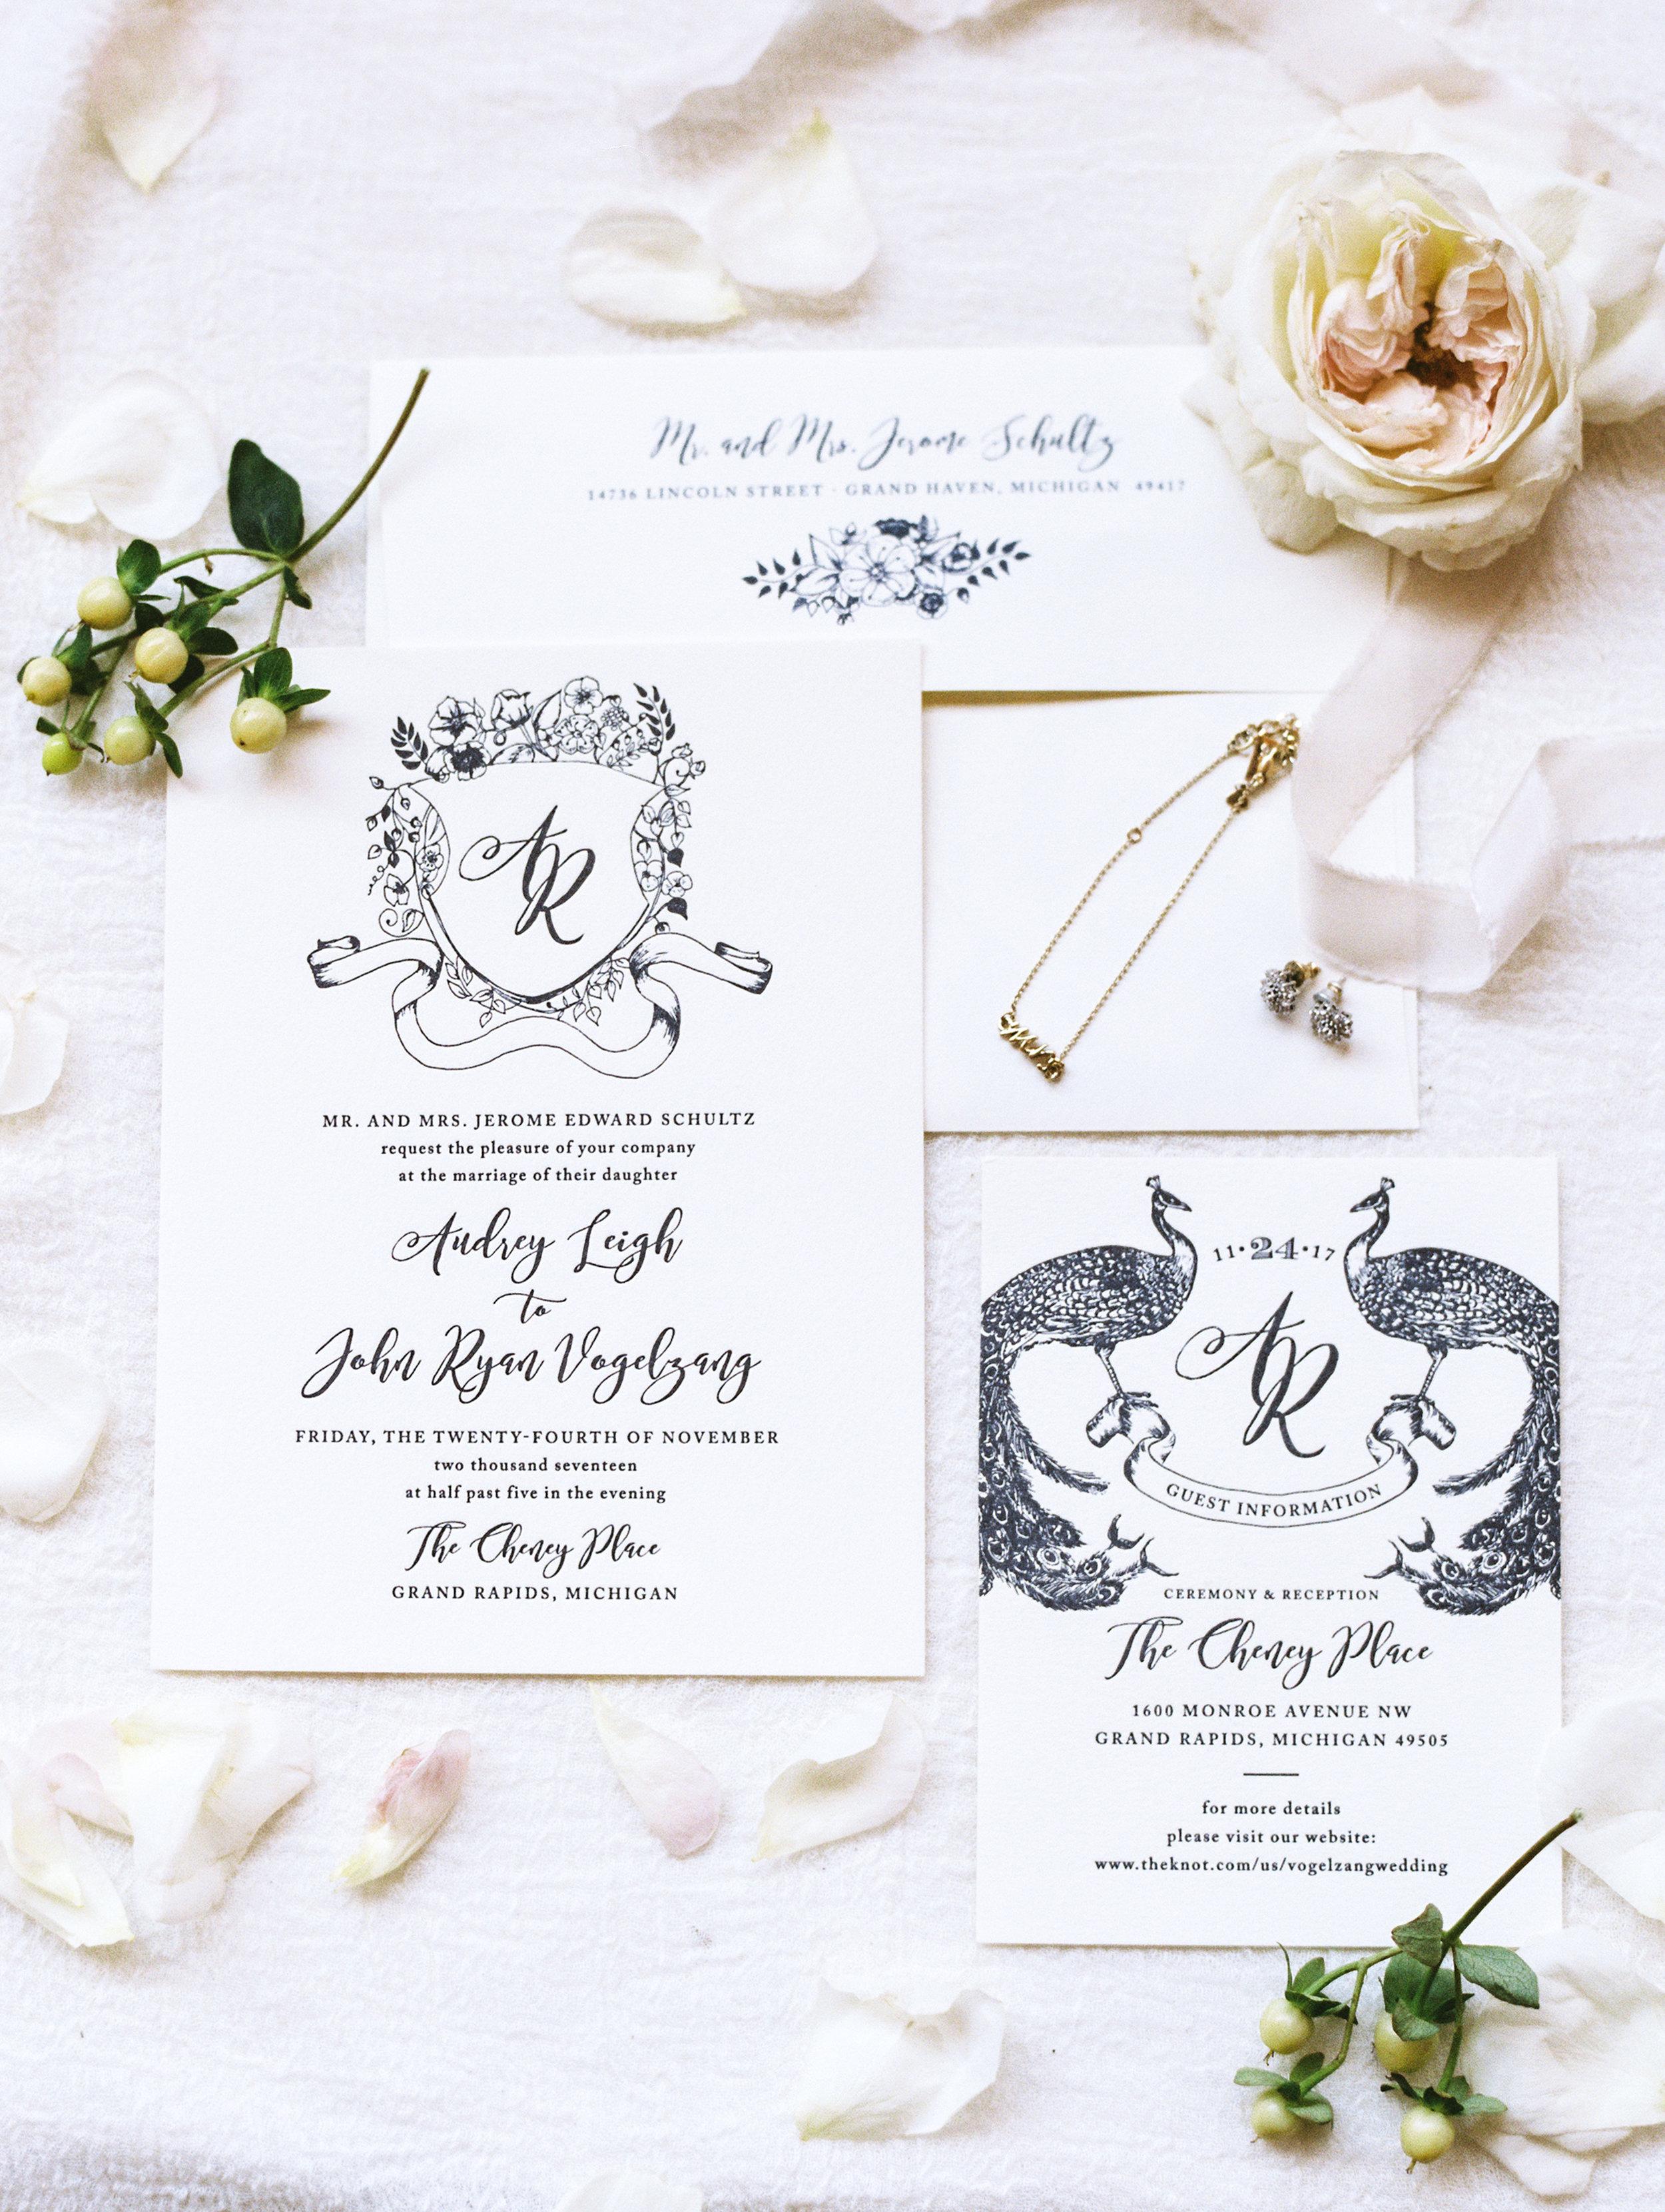 Vogelzang+Wedding+Details+b-10.jpg